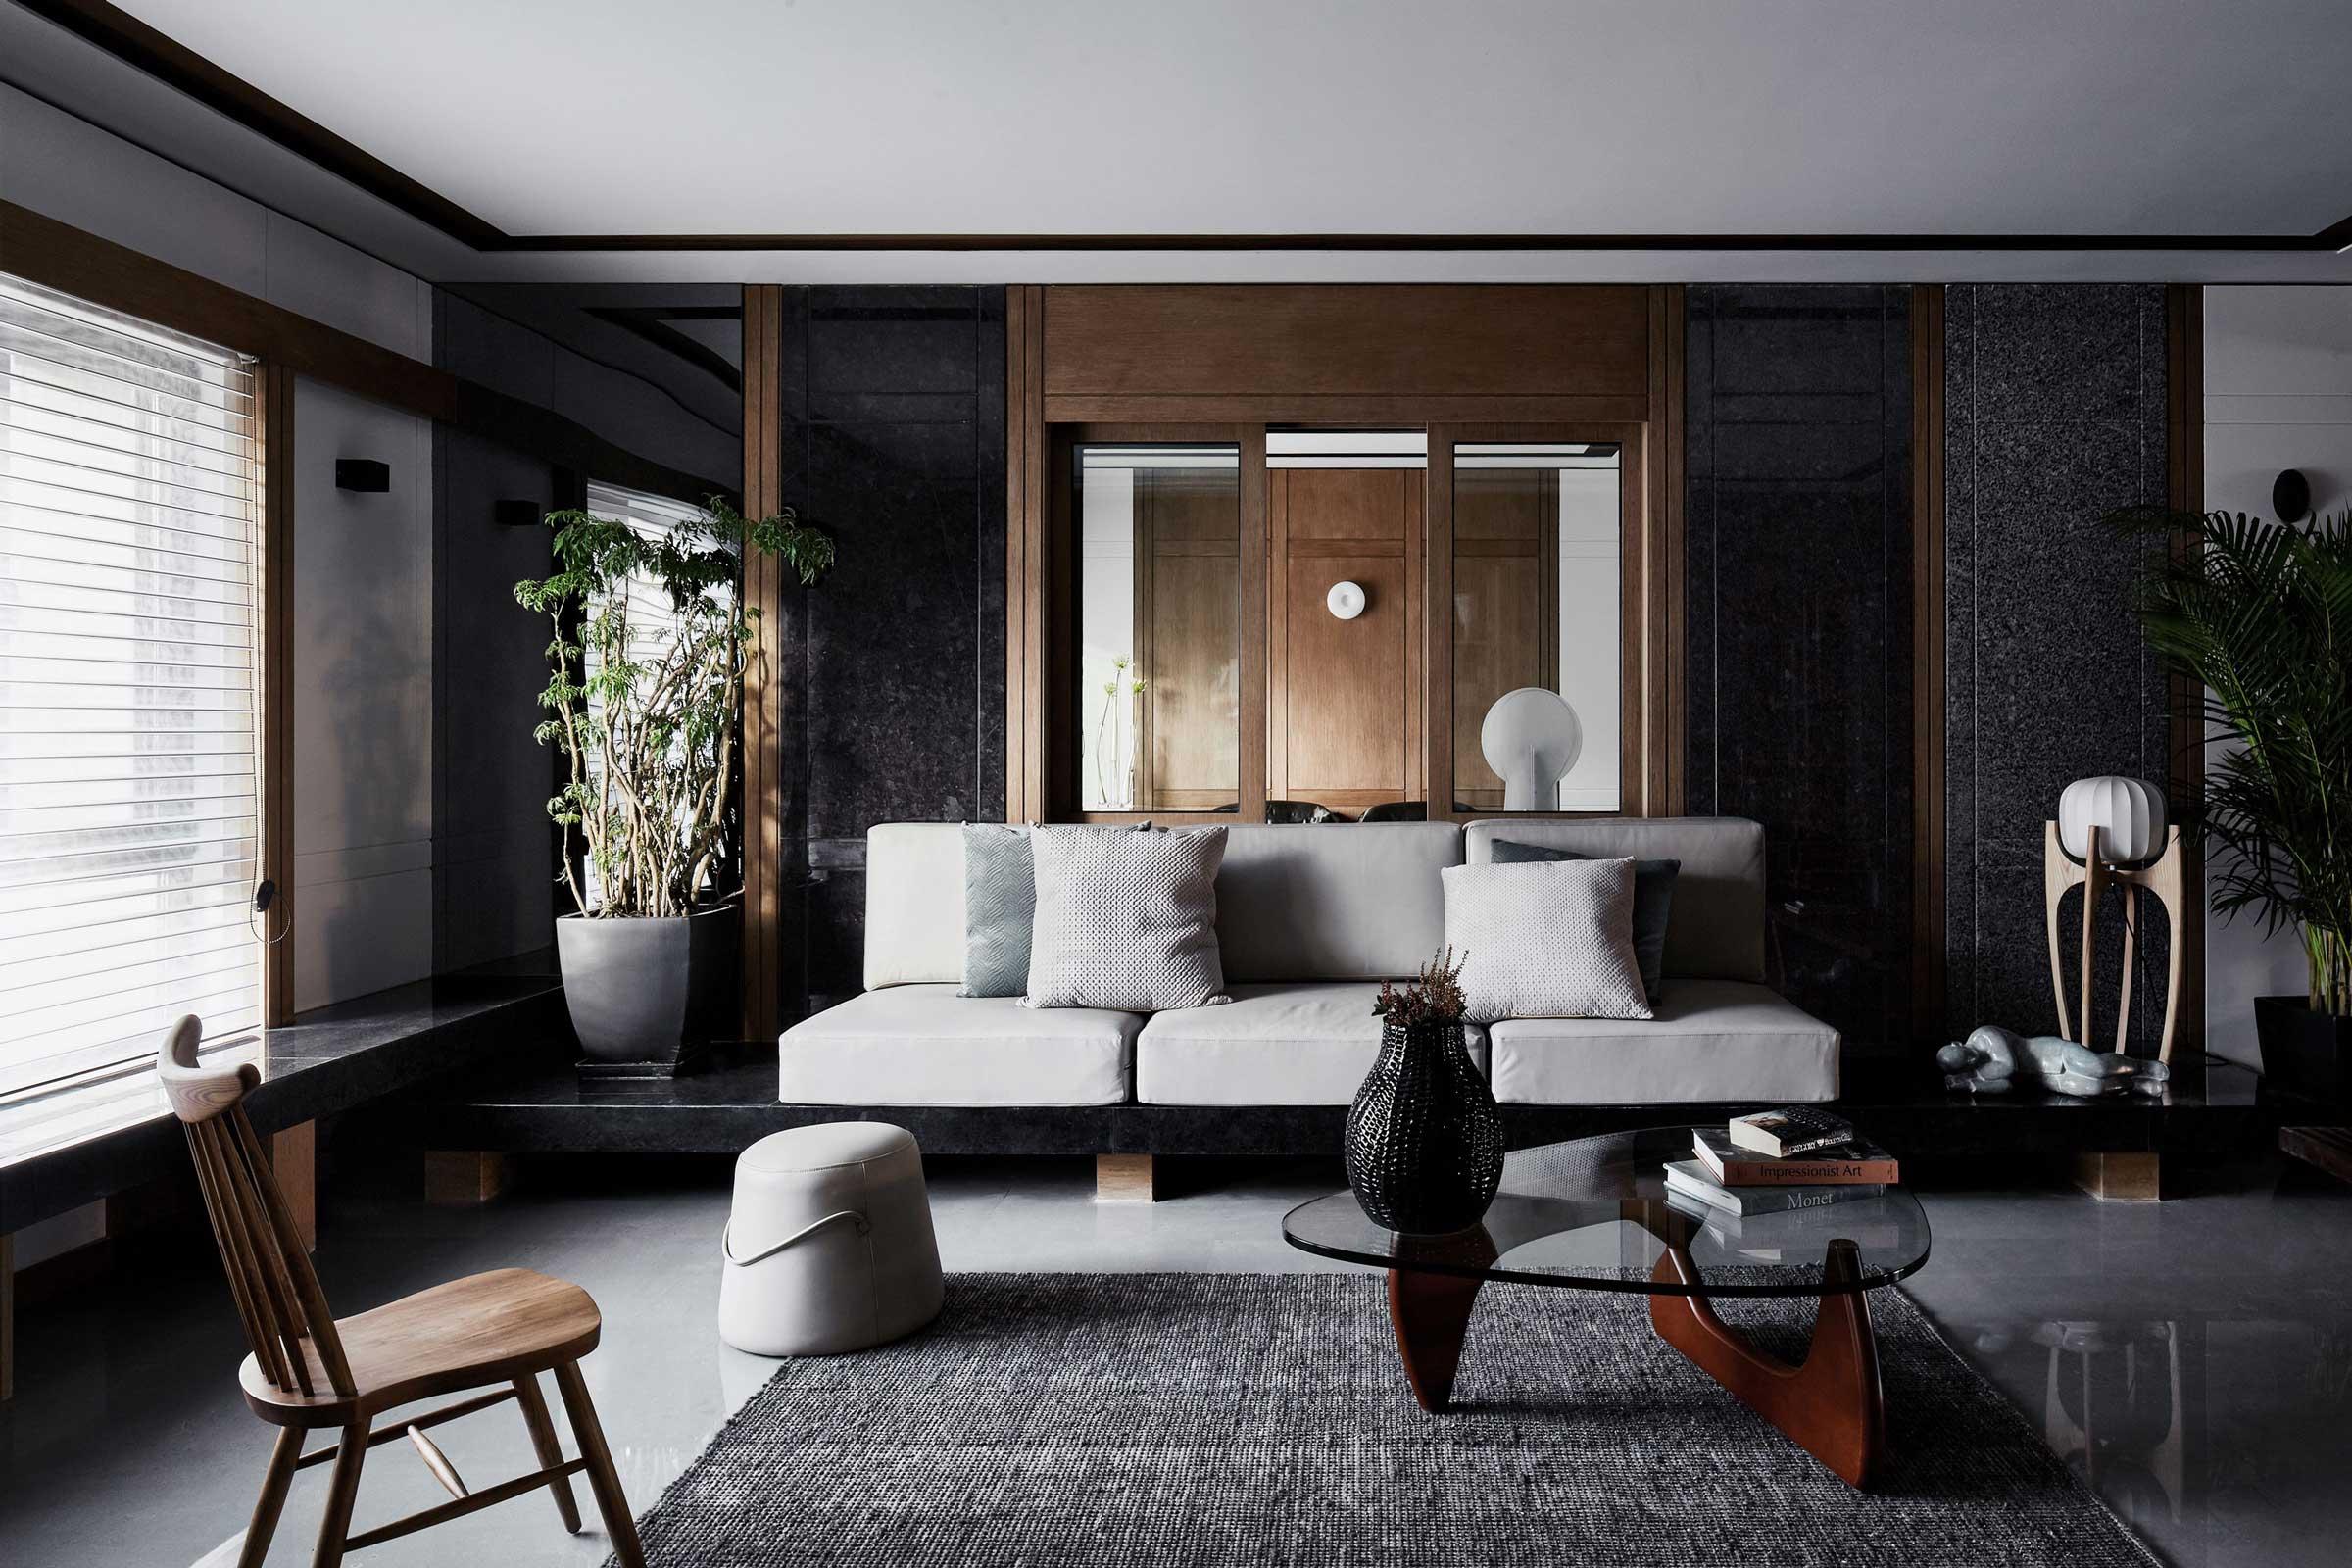 lane-house-ARCHISTRY-nolan-chao-01-living-room.jpg